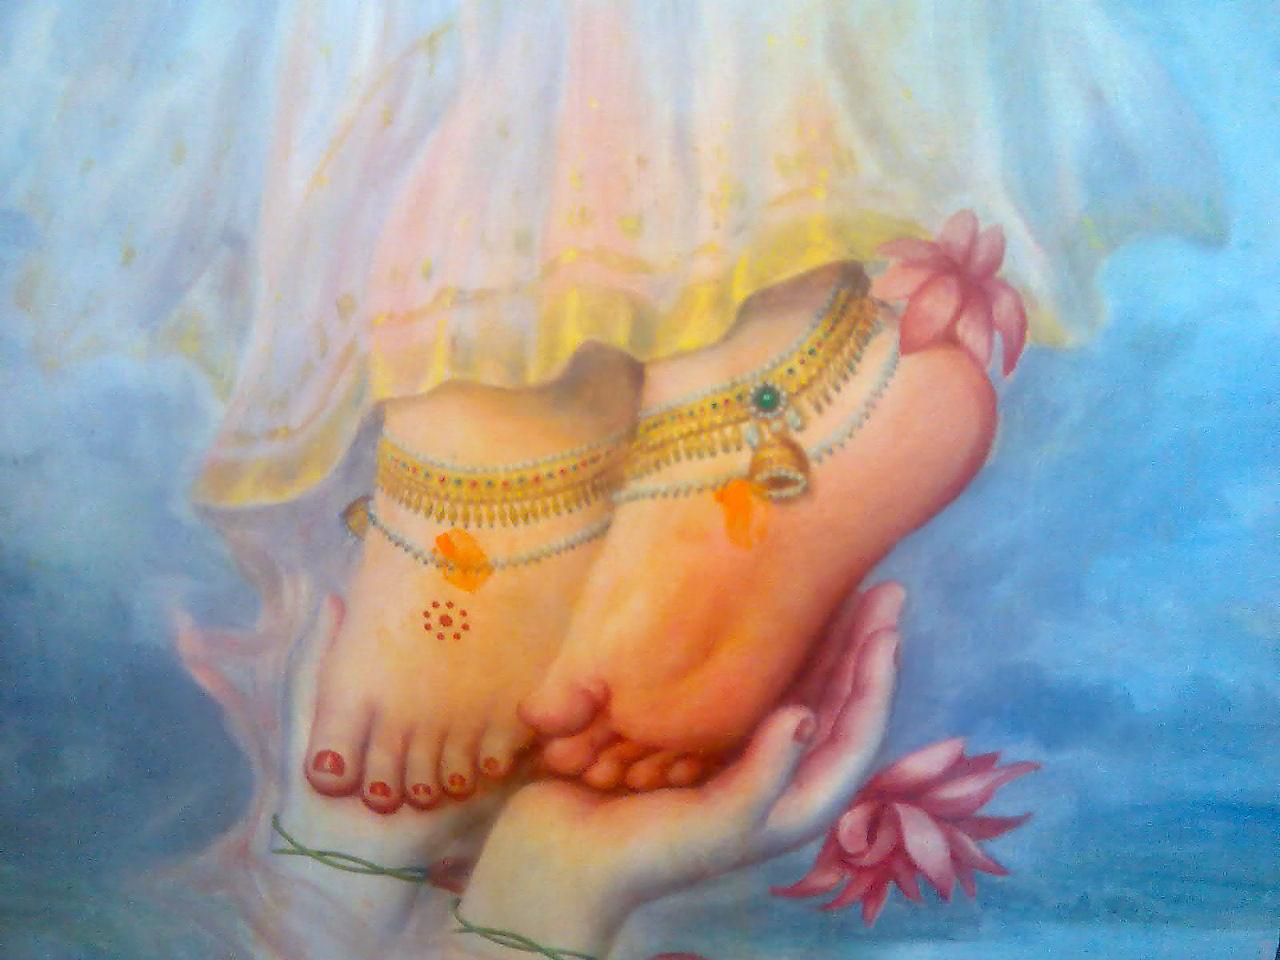 The Lotusfeet of Lord Sri Krishna